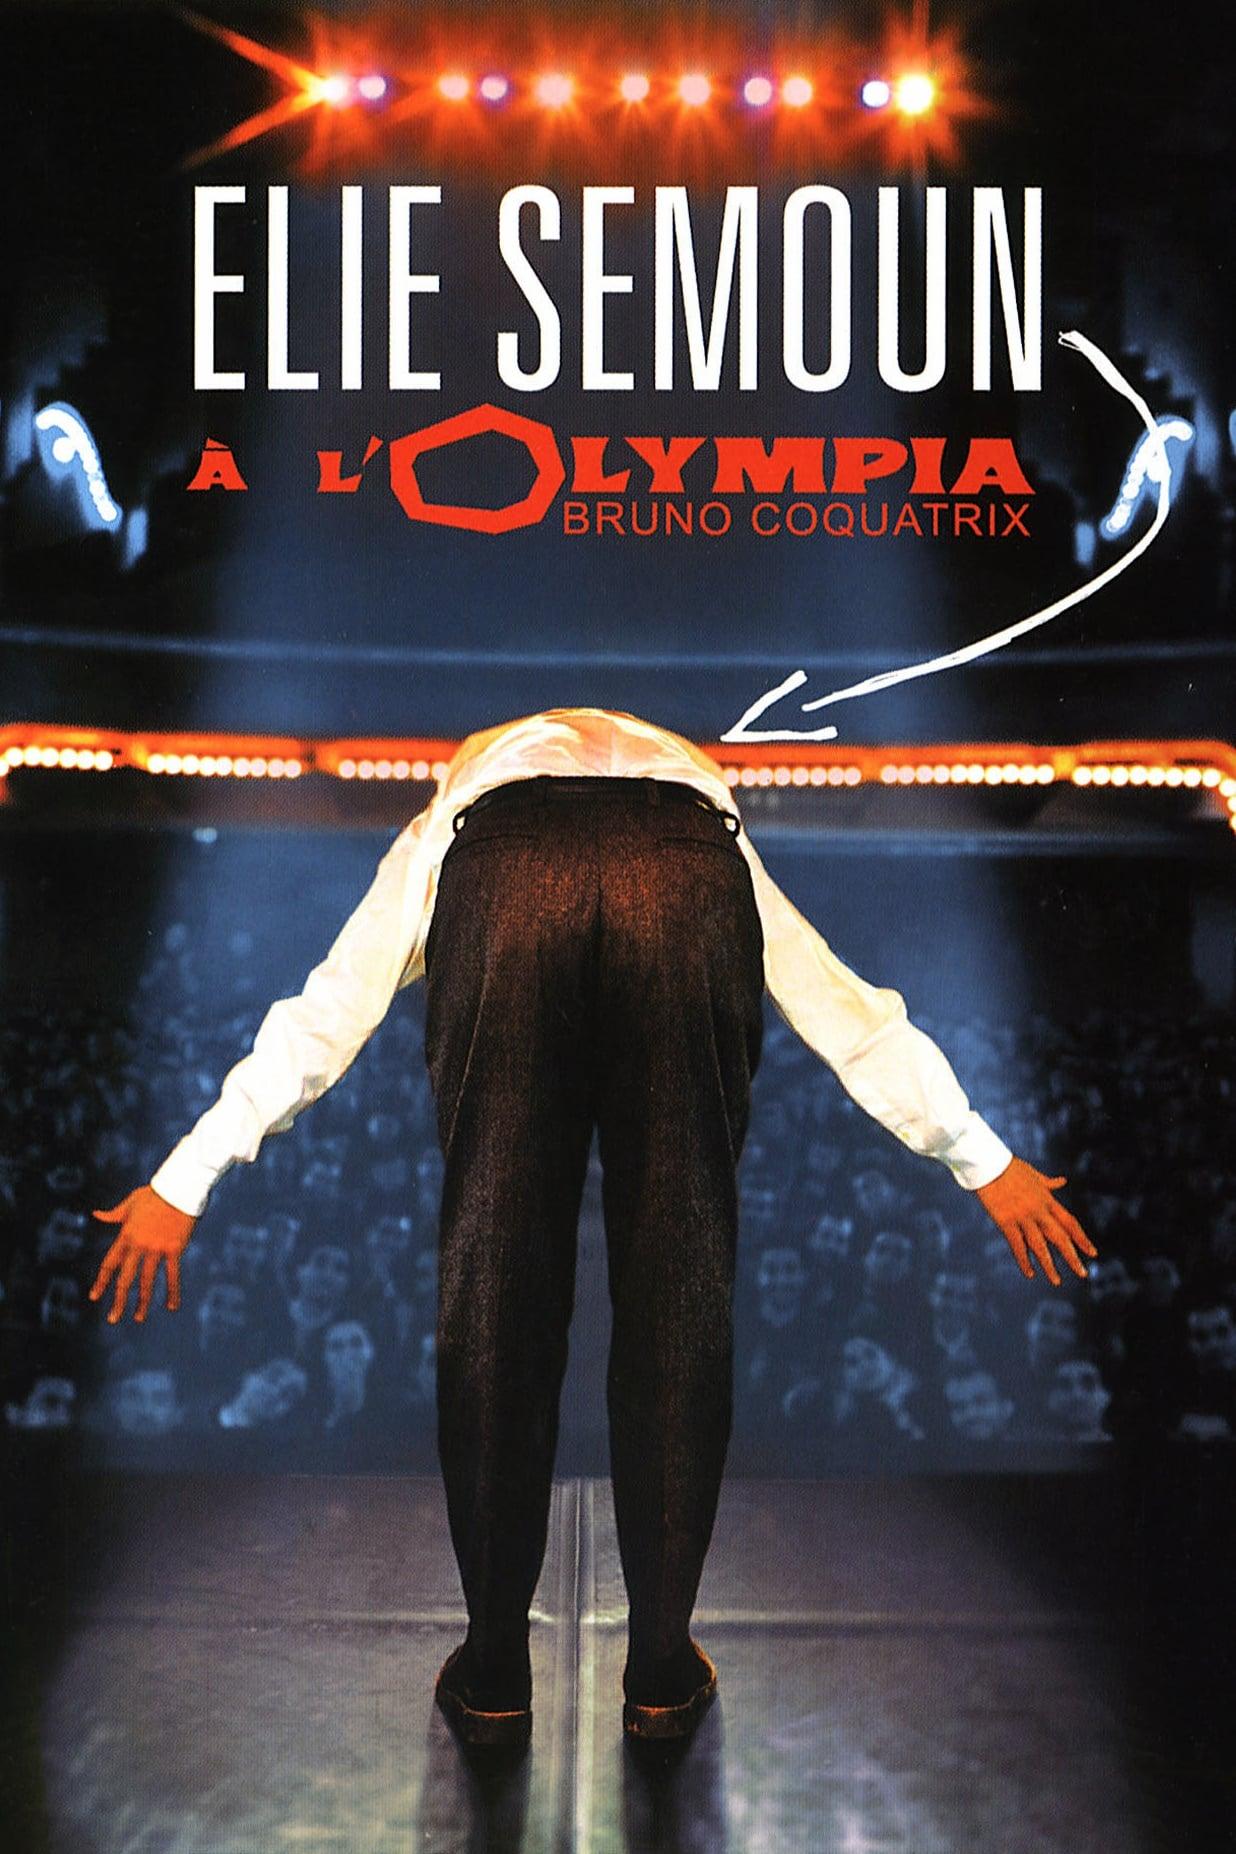 Elie Semoun à l'Olympia